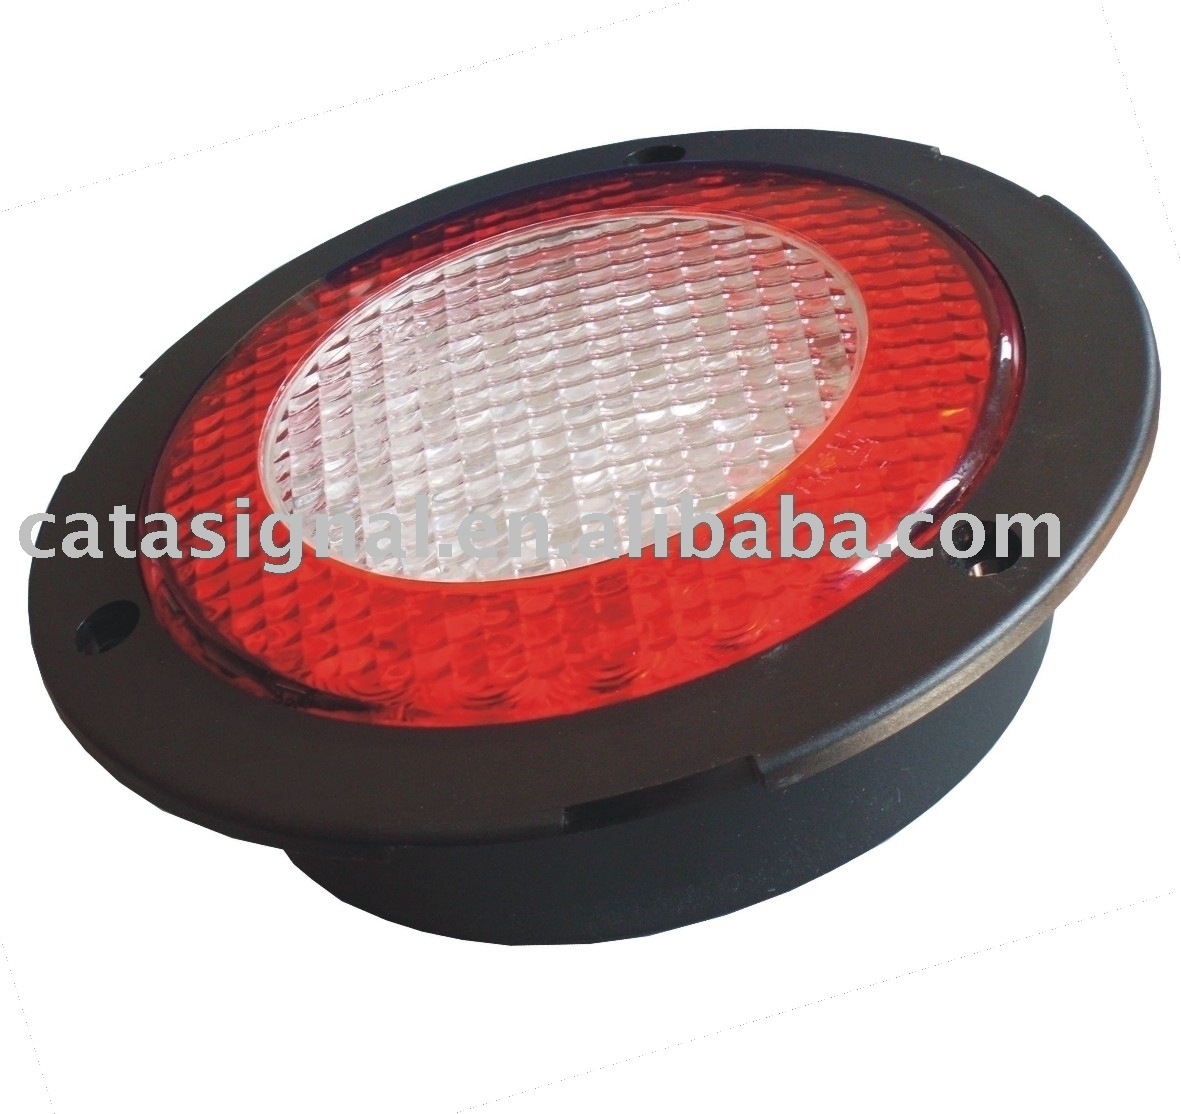 LightsReverseTaillampLicensePlateSideDirectionIndicator.jpg